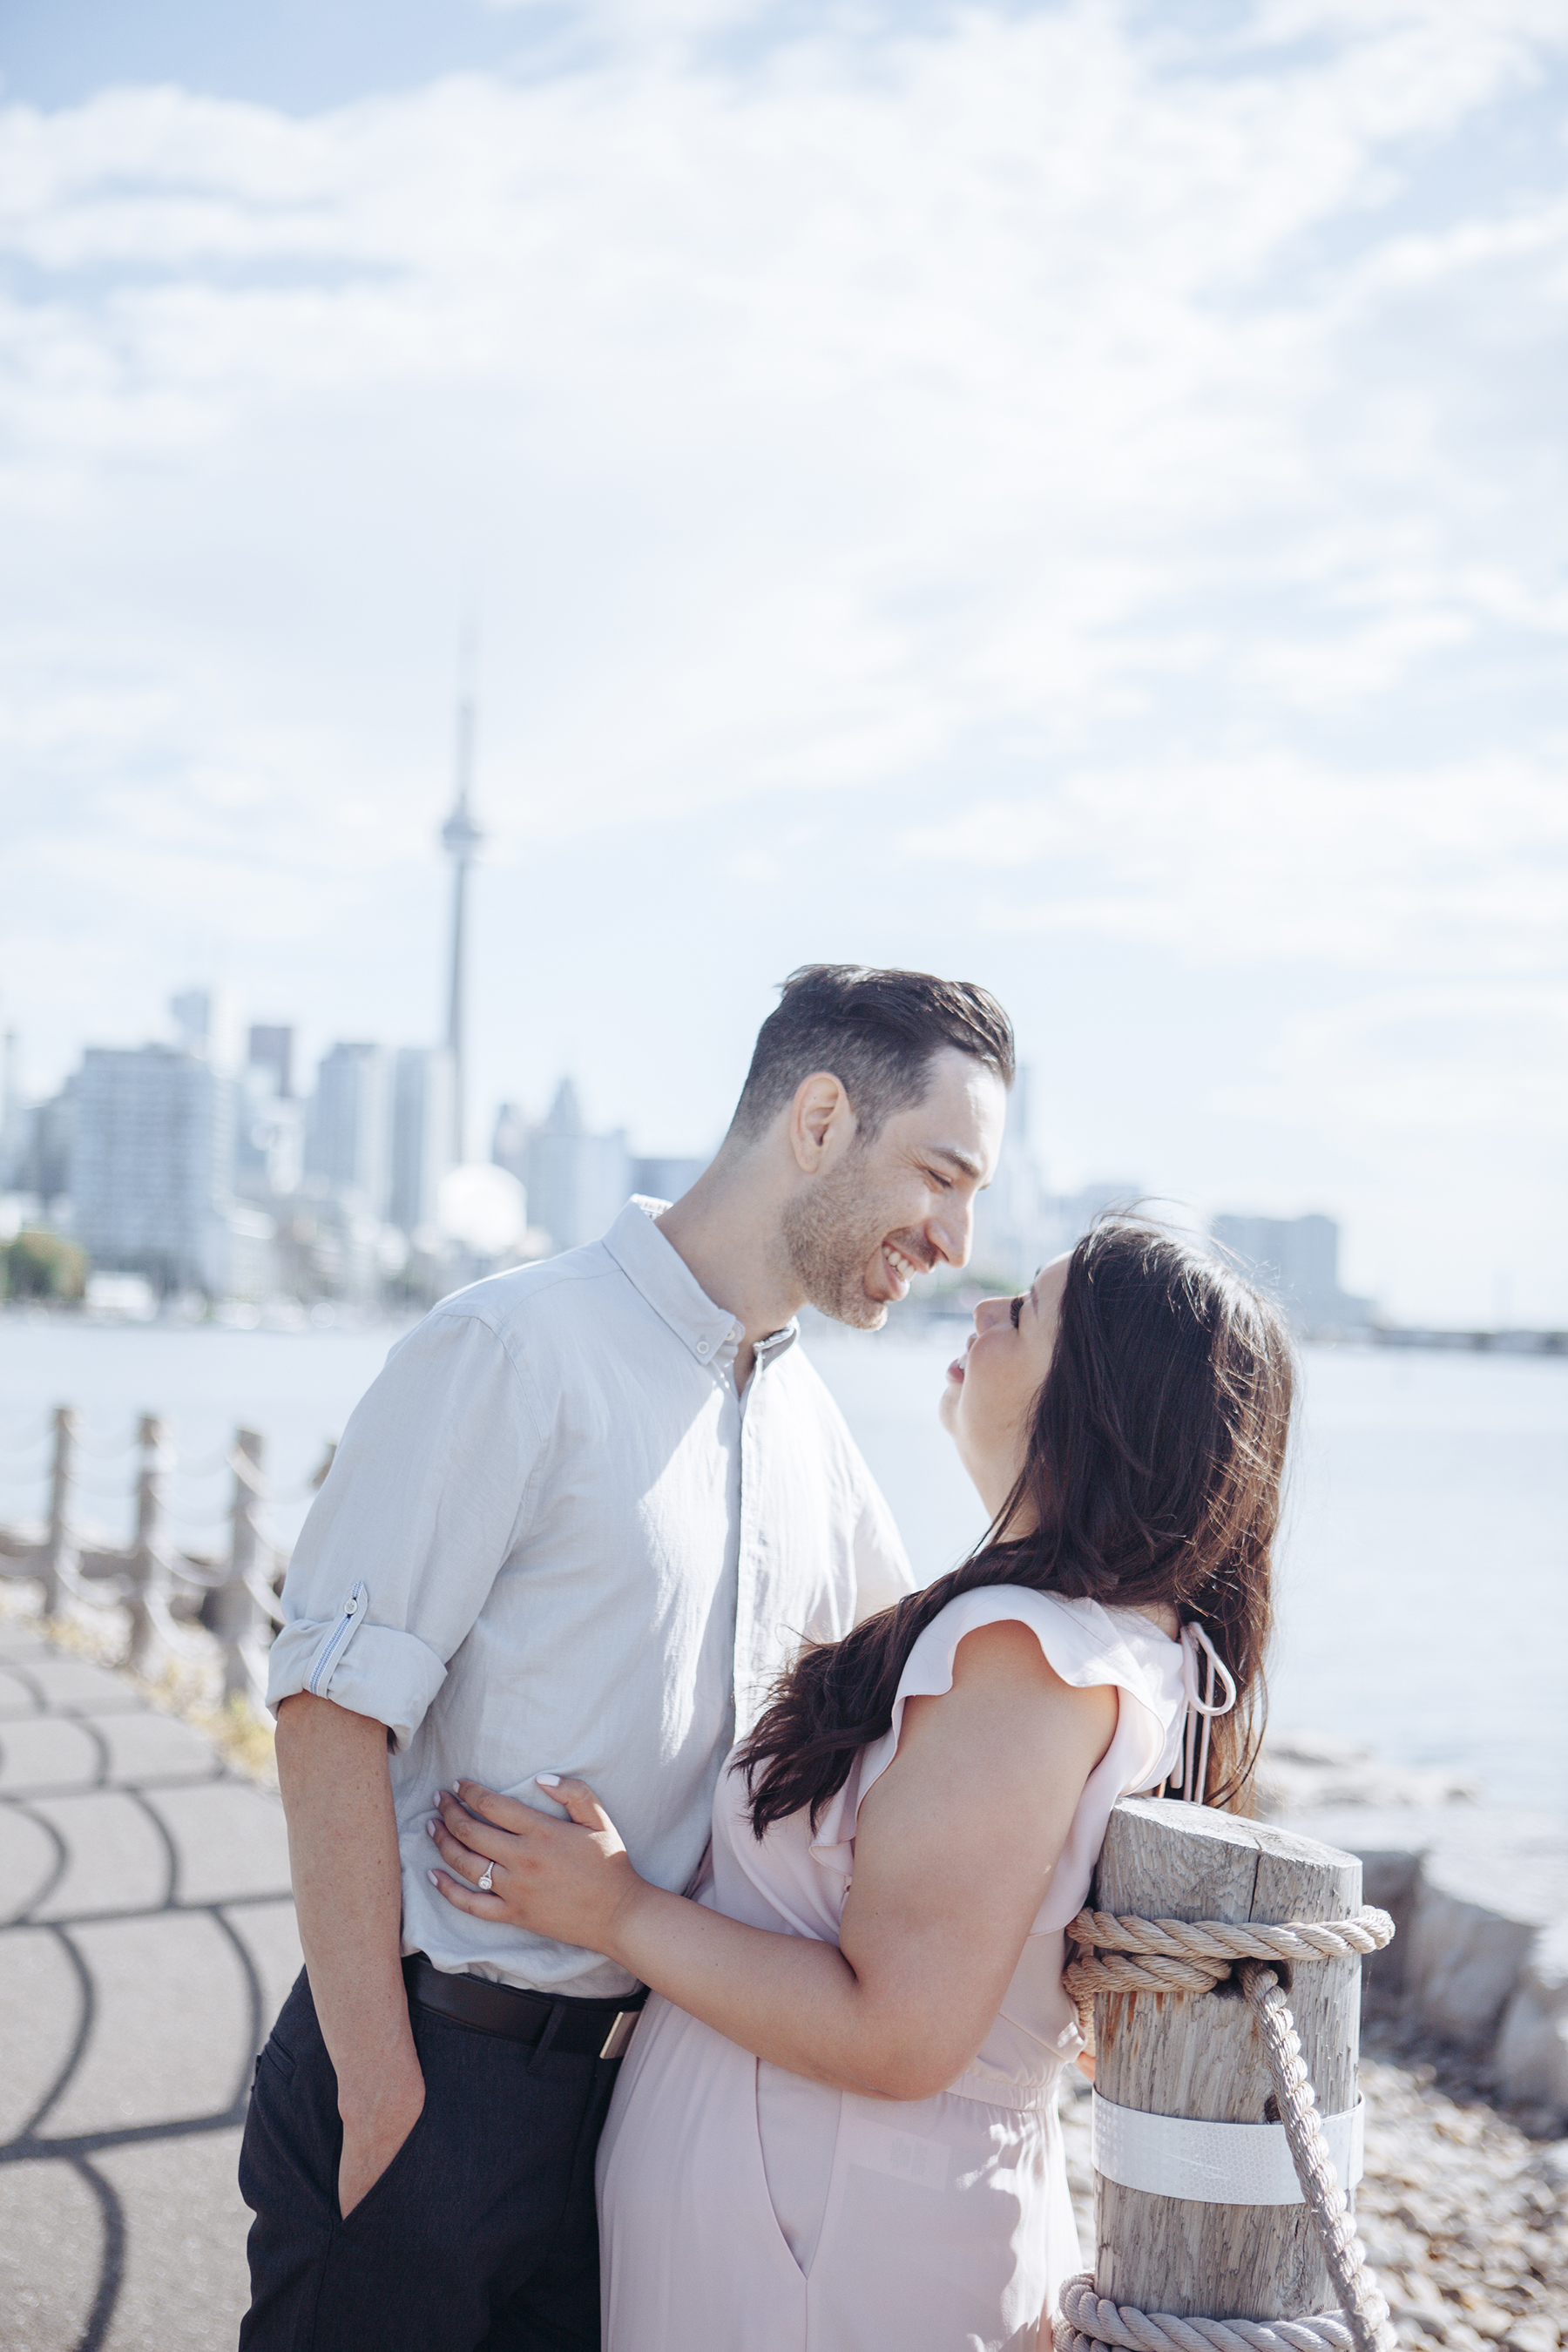 Trillium Park Engagement Session in Toronto Lisa Vigliotta Photography10